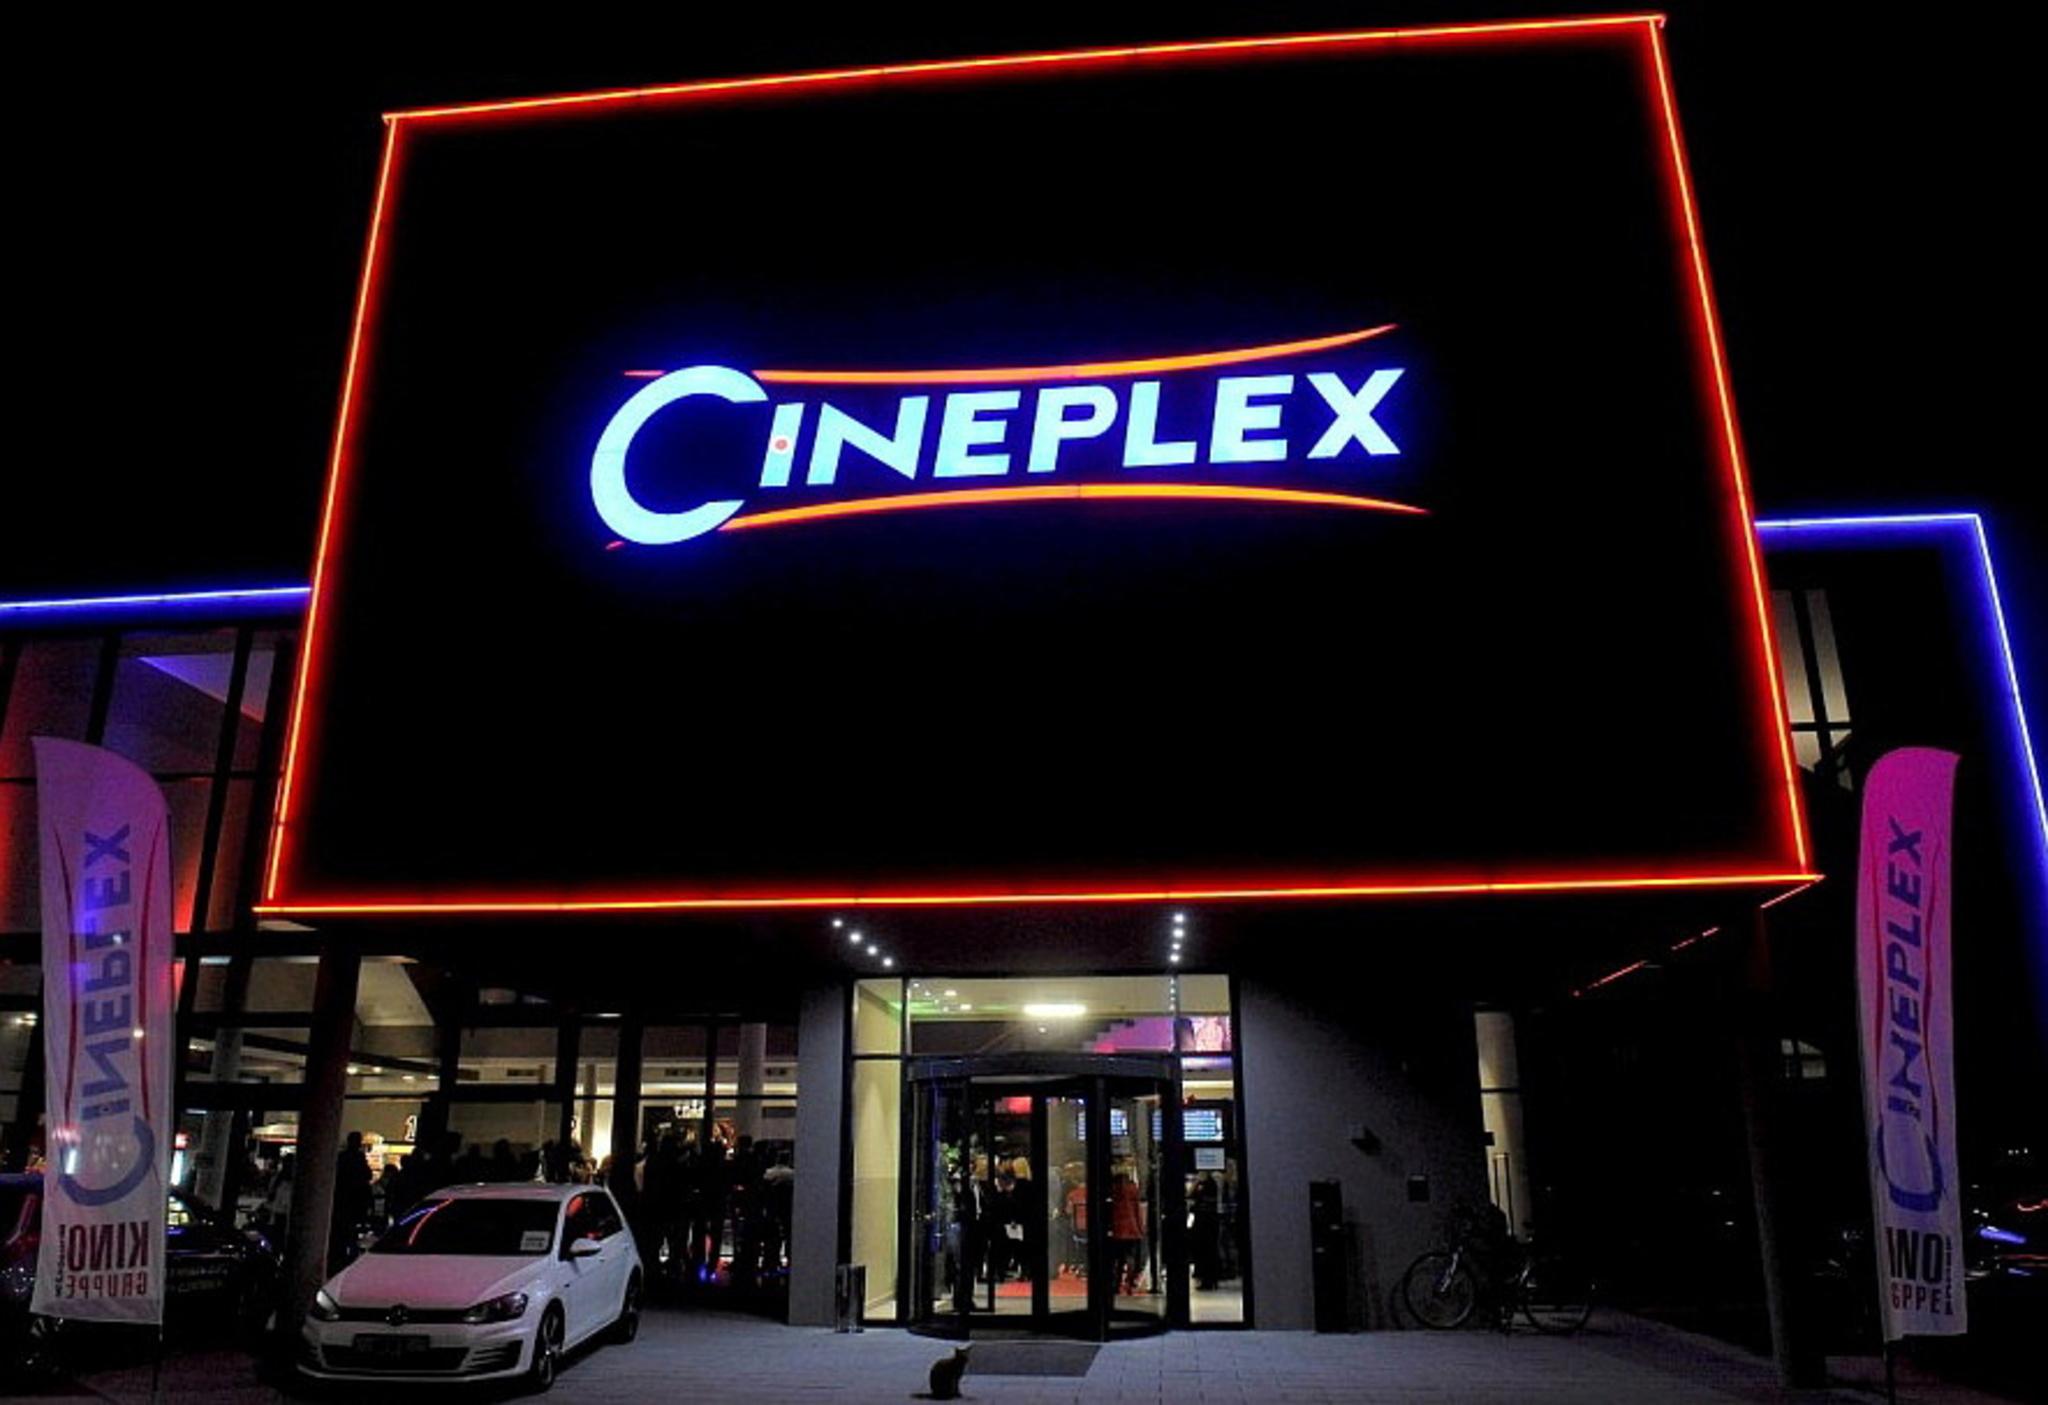 Penzing Cineplex